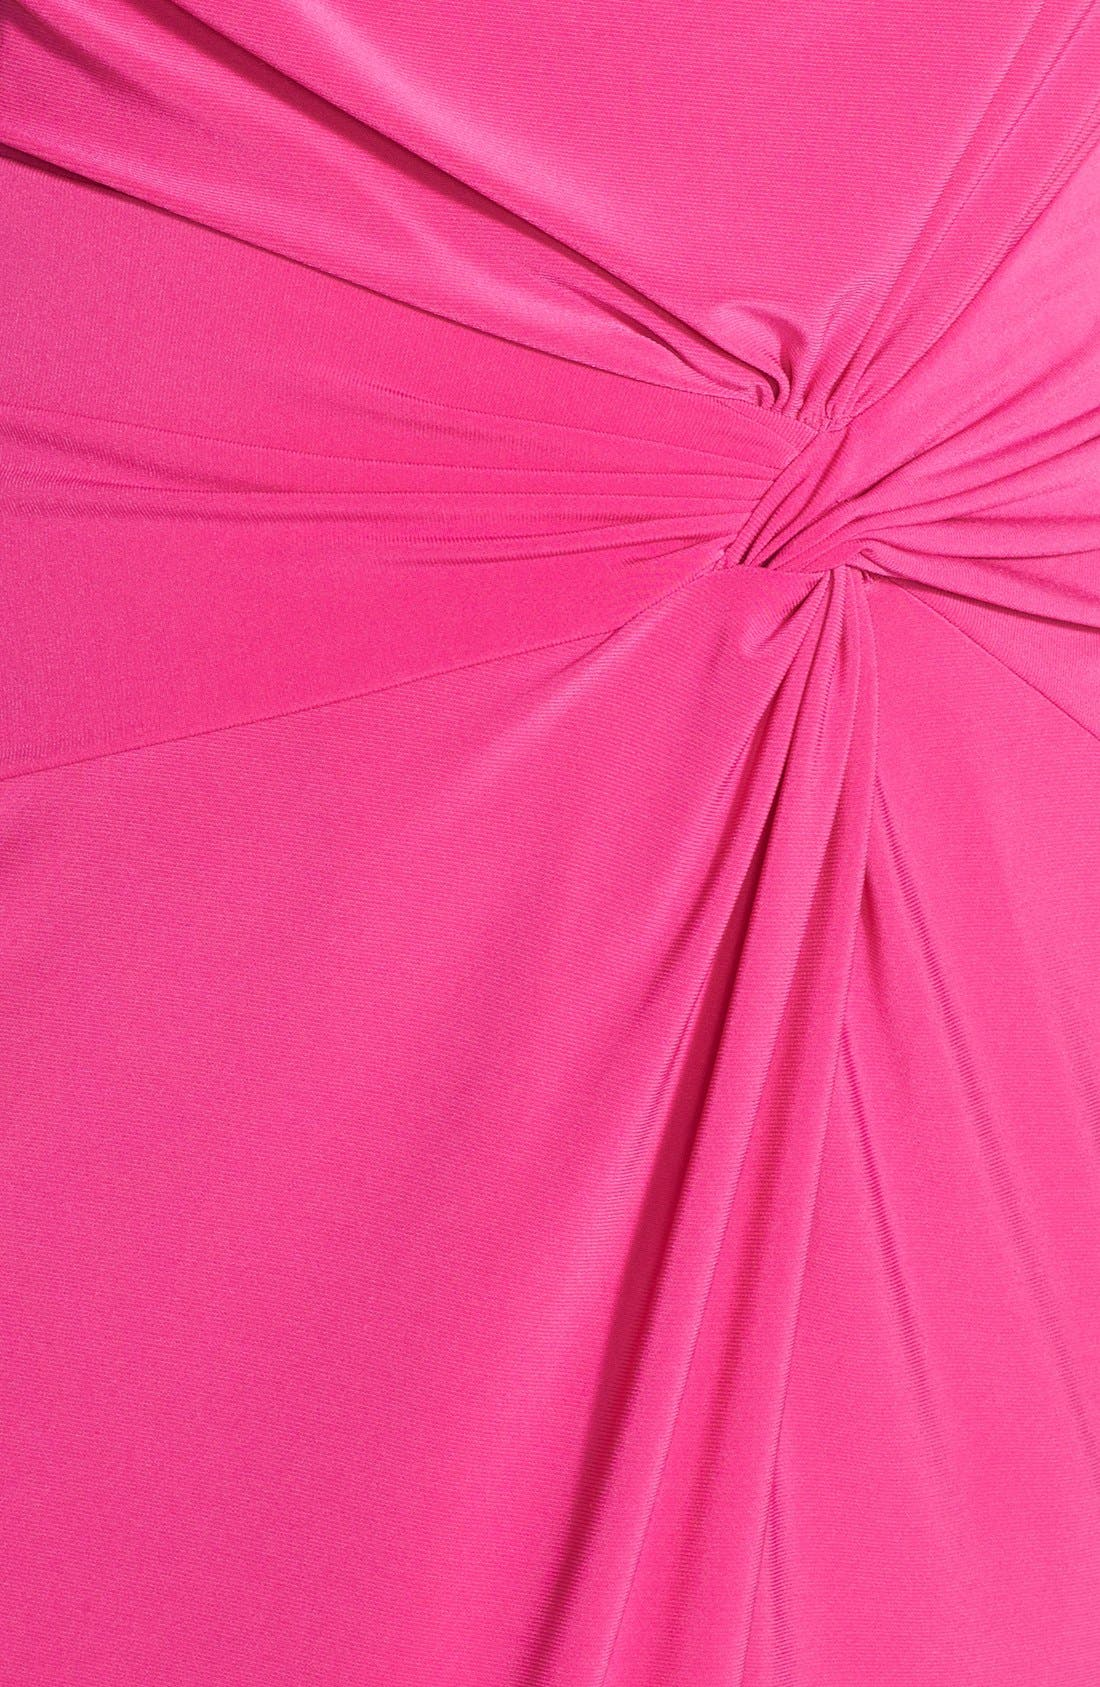 Alternate Image 3  - Adrianna Papell Asymmetric Drape Cowl Neck Jersey Sheath Dress (Plus Size)